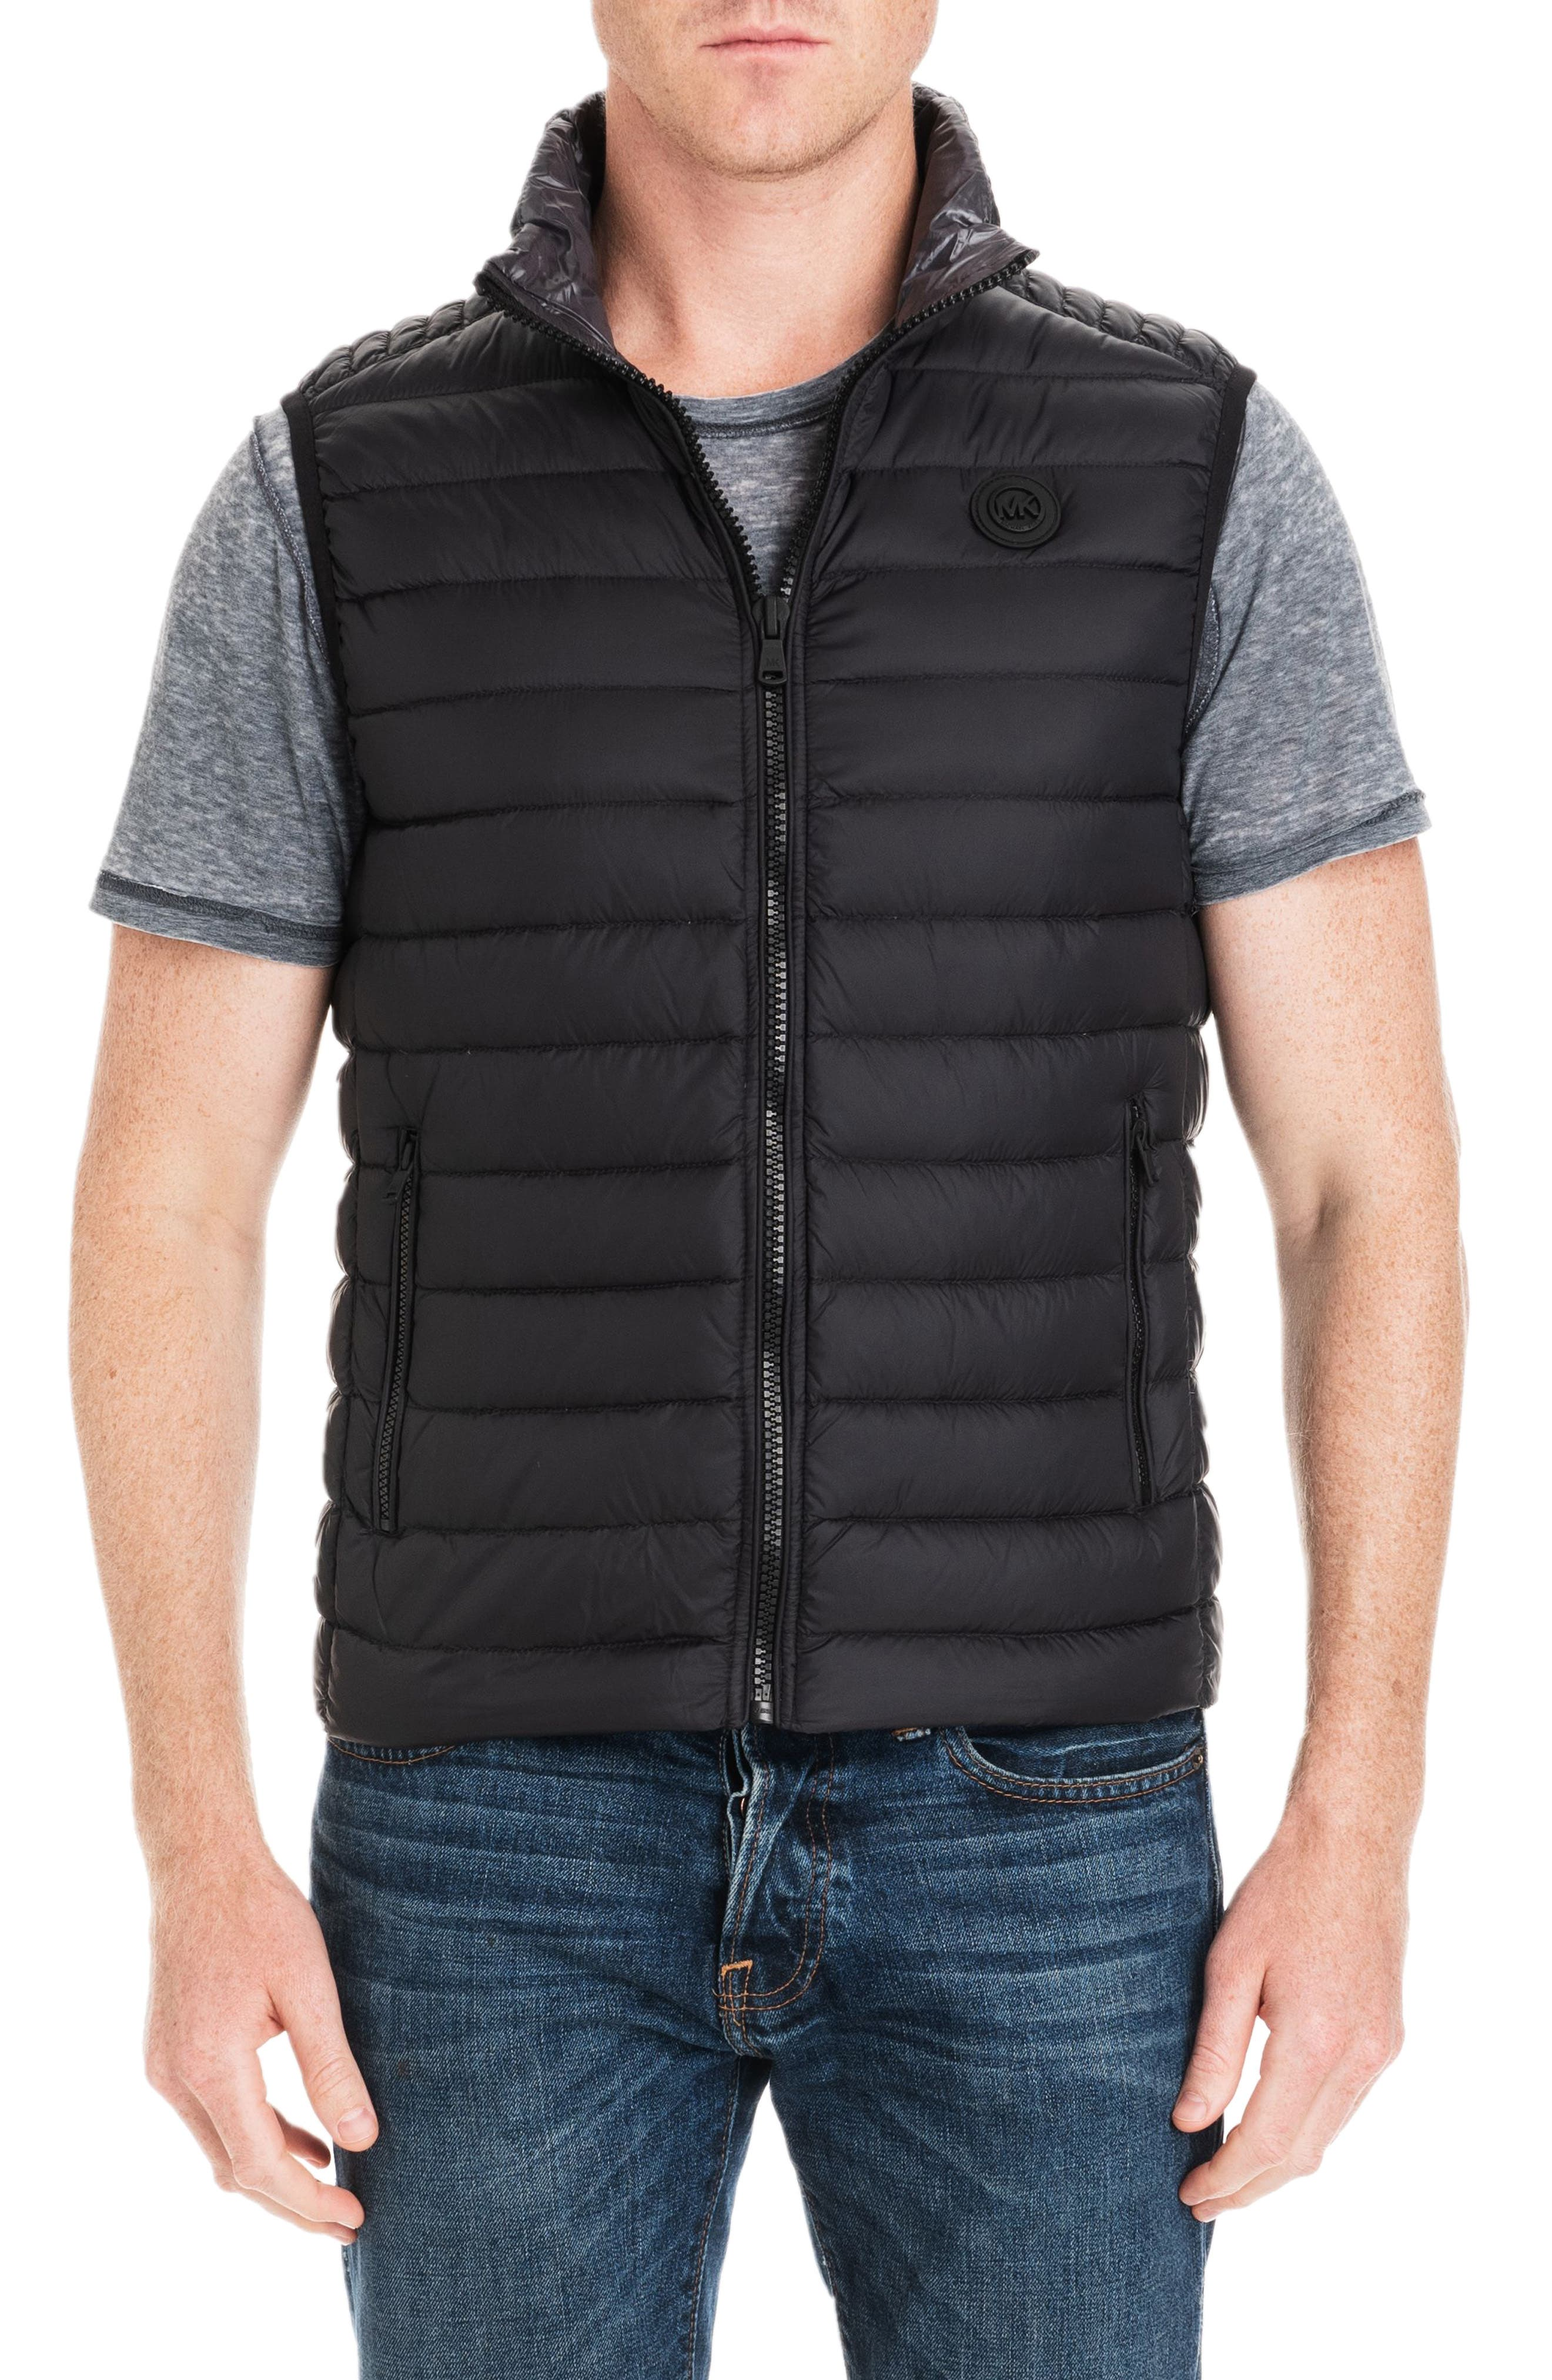 Michael Kors Slim Fit Packable Down Vest, Black (Online Only)